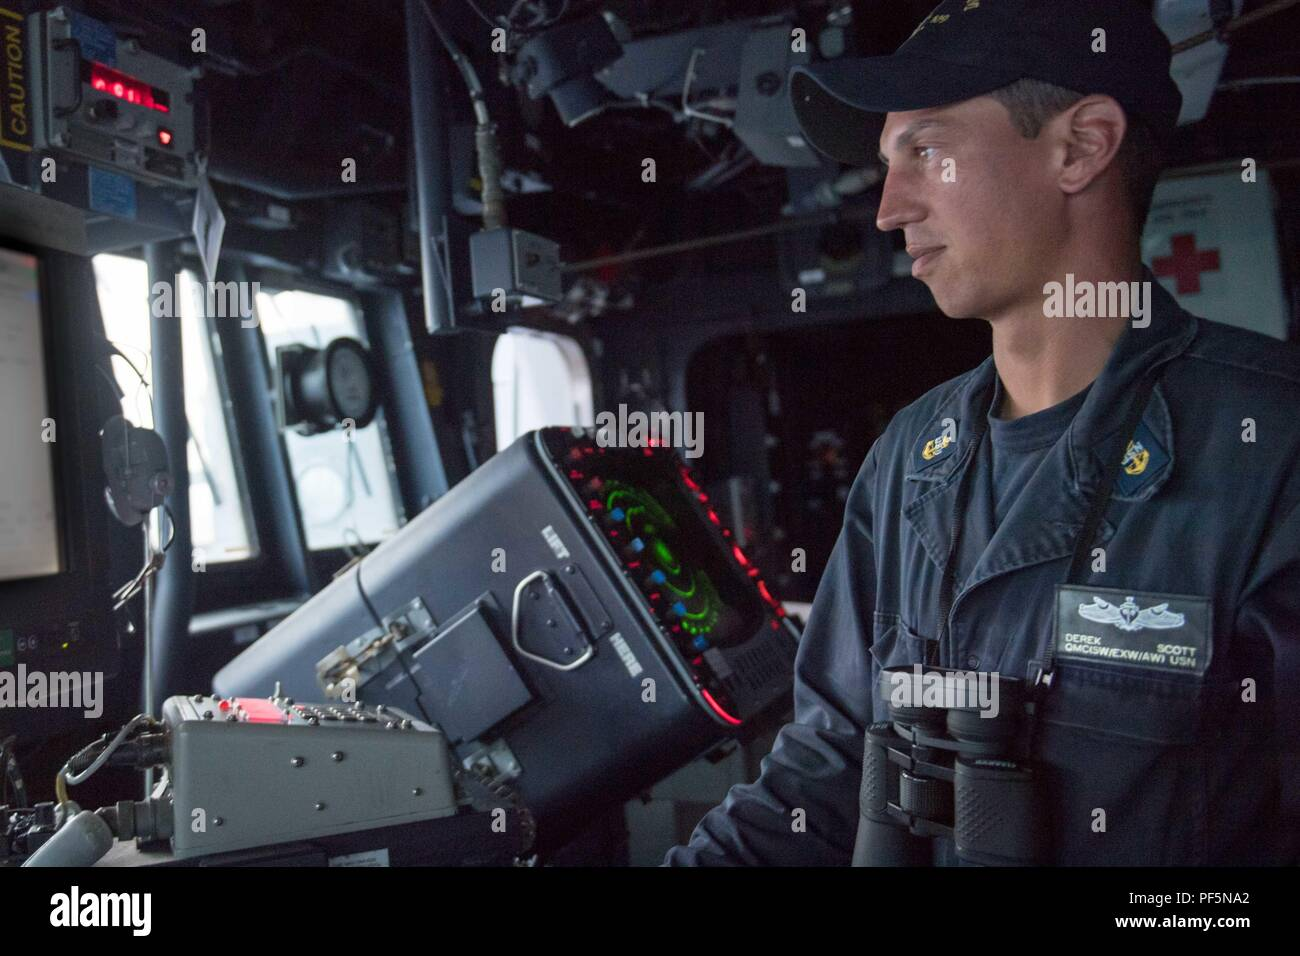 Indian Navy Chief Stock Photos & Indian Navy Chief Stock